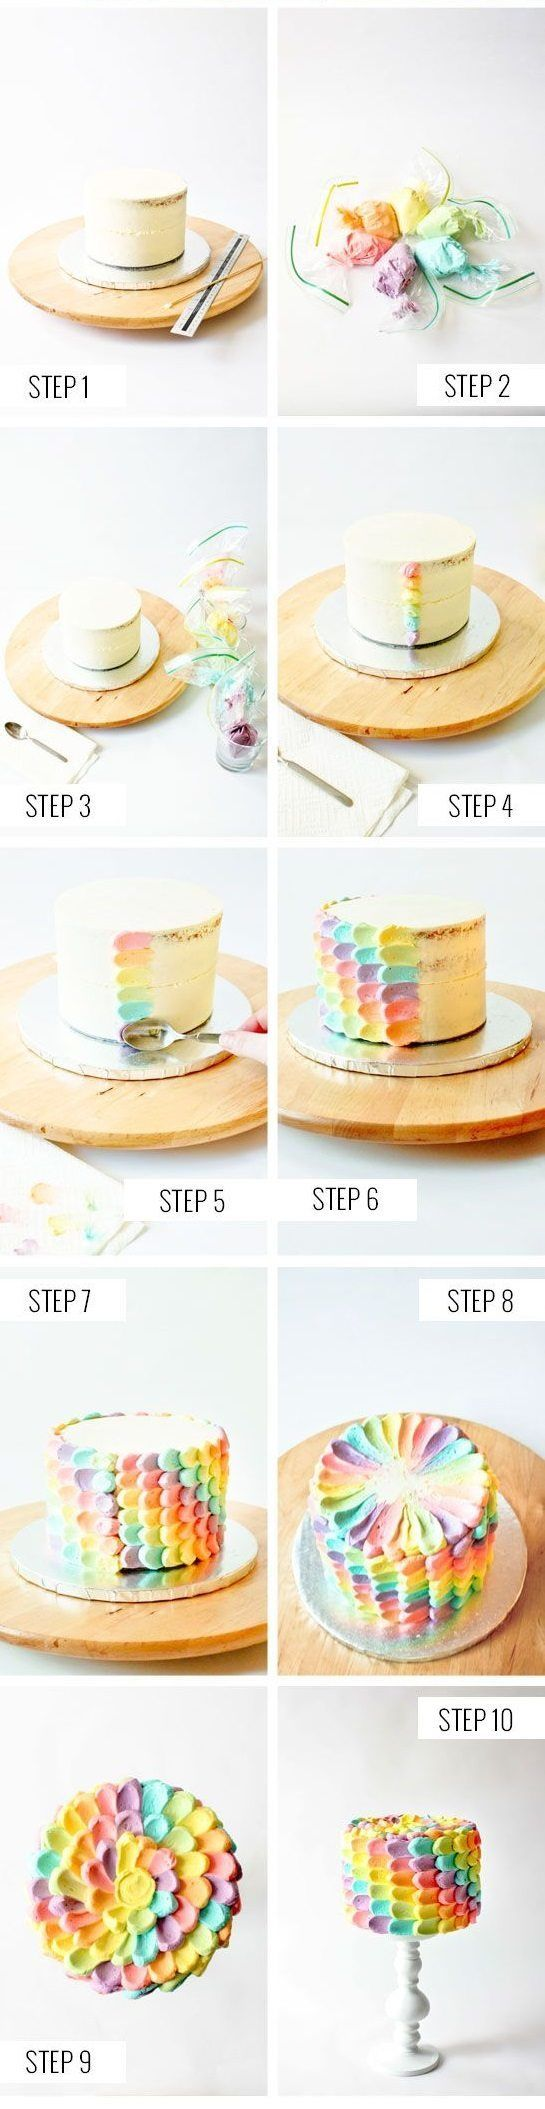 How to make a smear cake using a teaspoon- so easy!